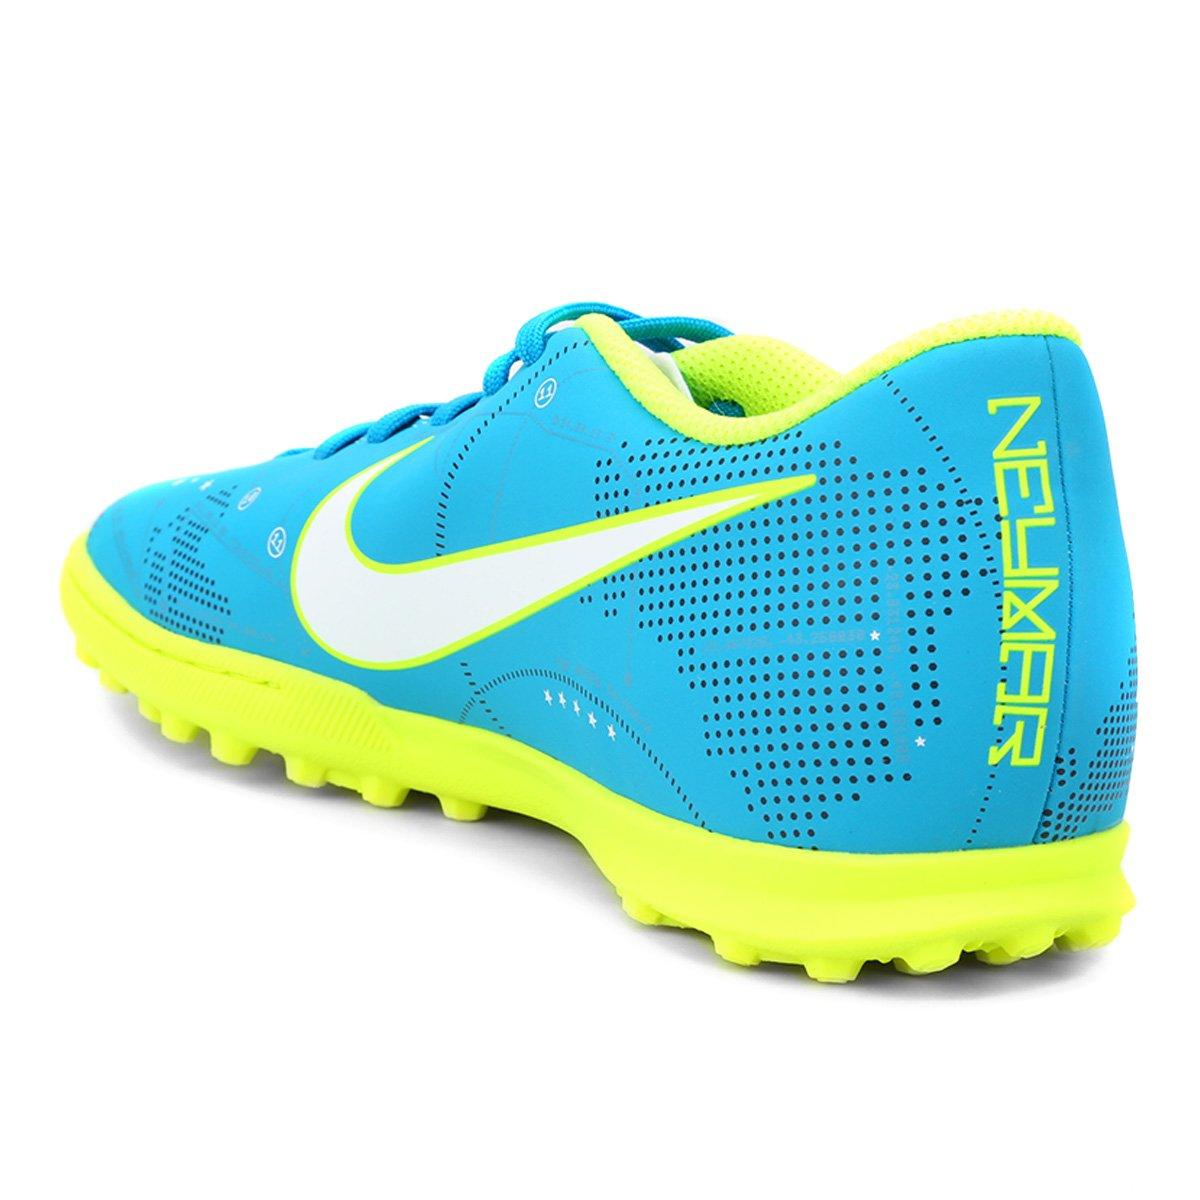 48268e6171 Chuteira Society Nike Mercurial Vortex 3 Neymar Jr TF - Azul e ...